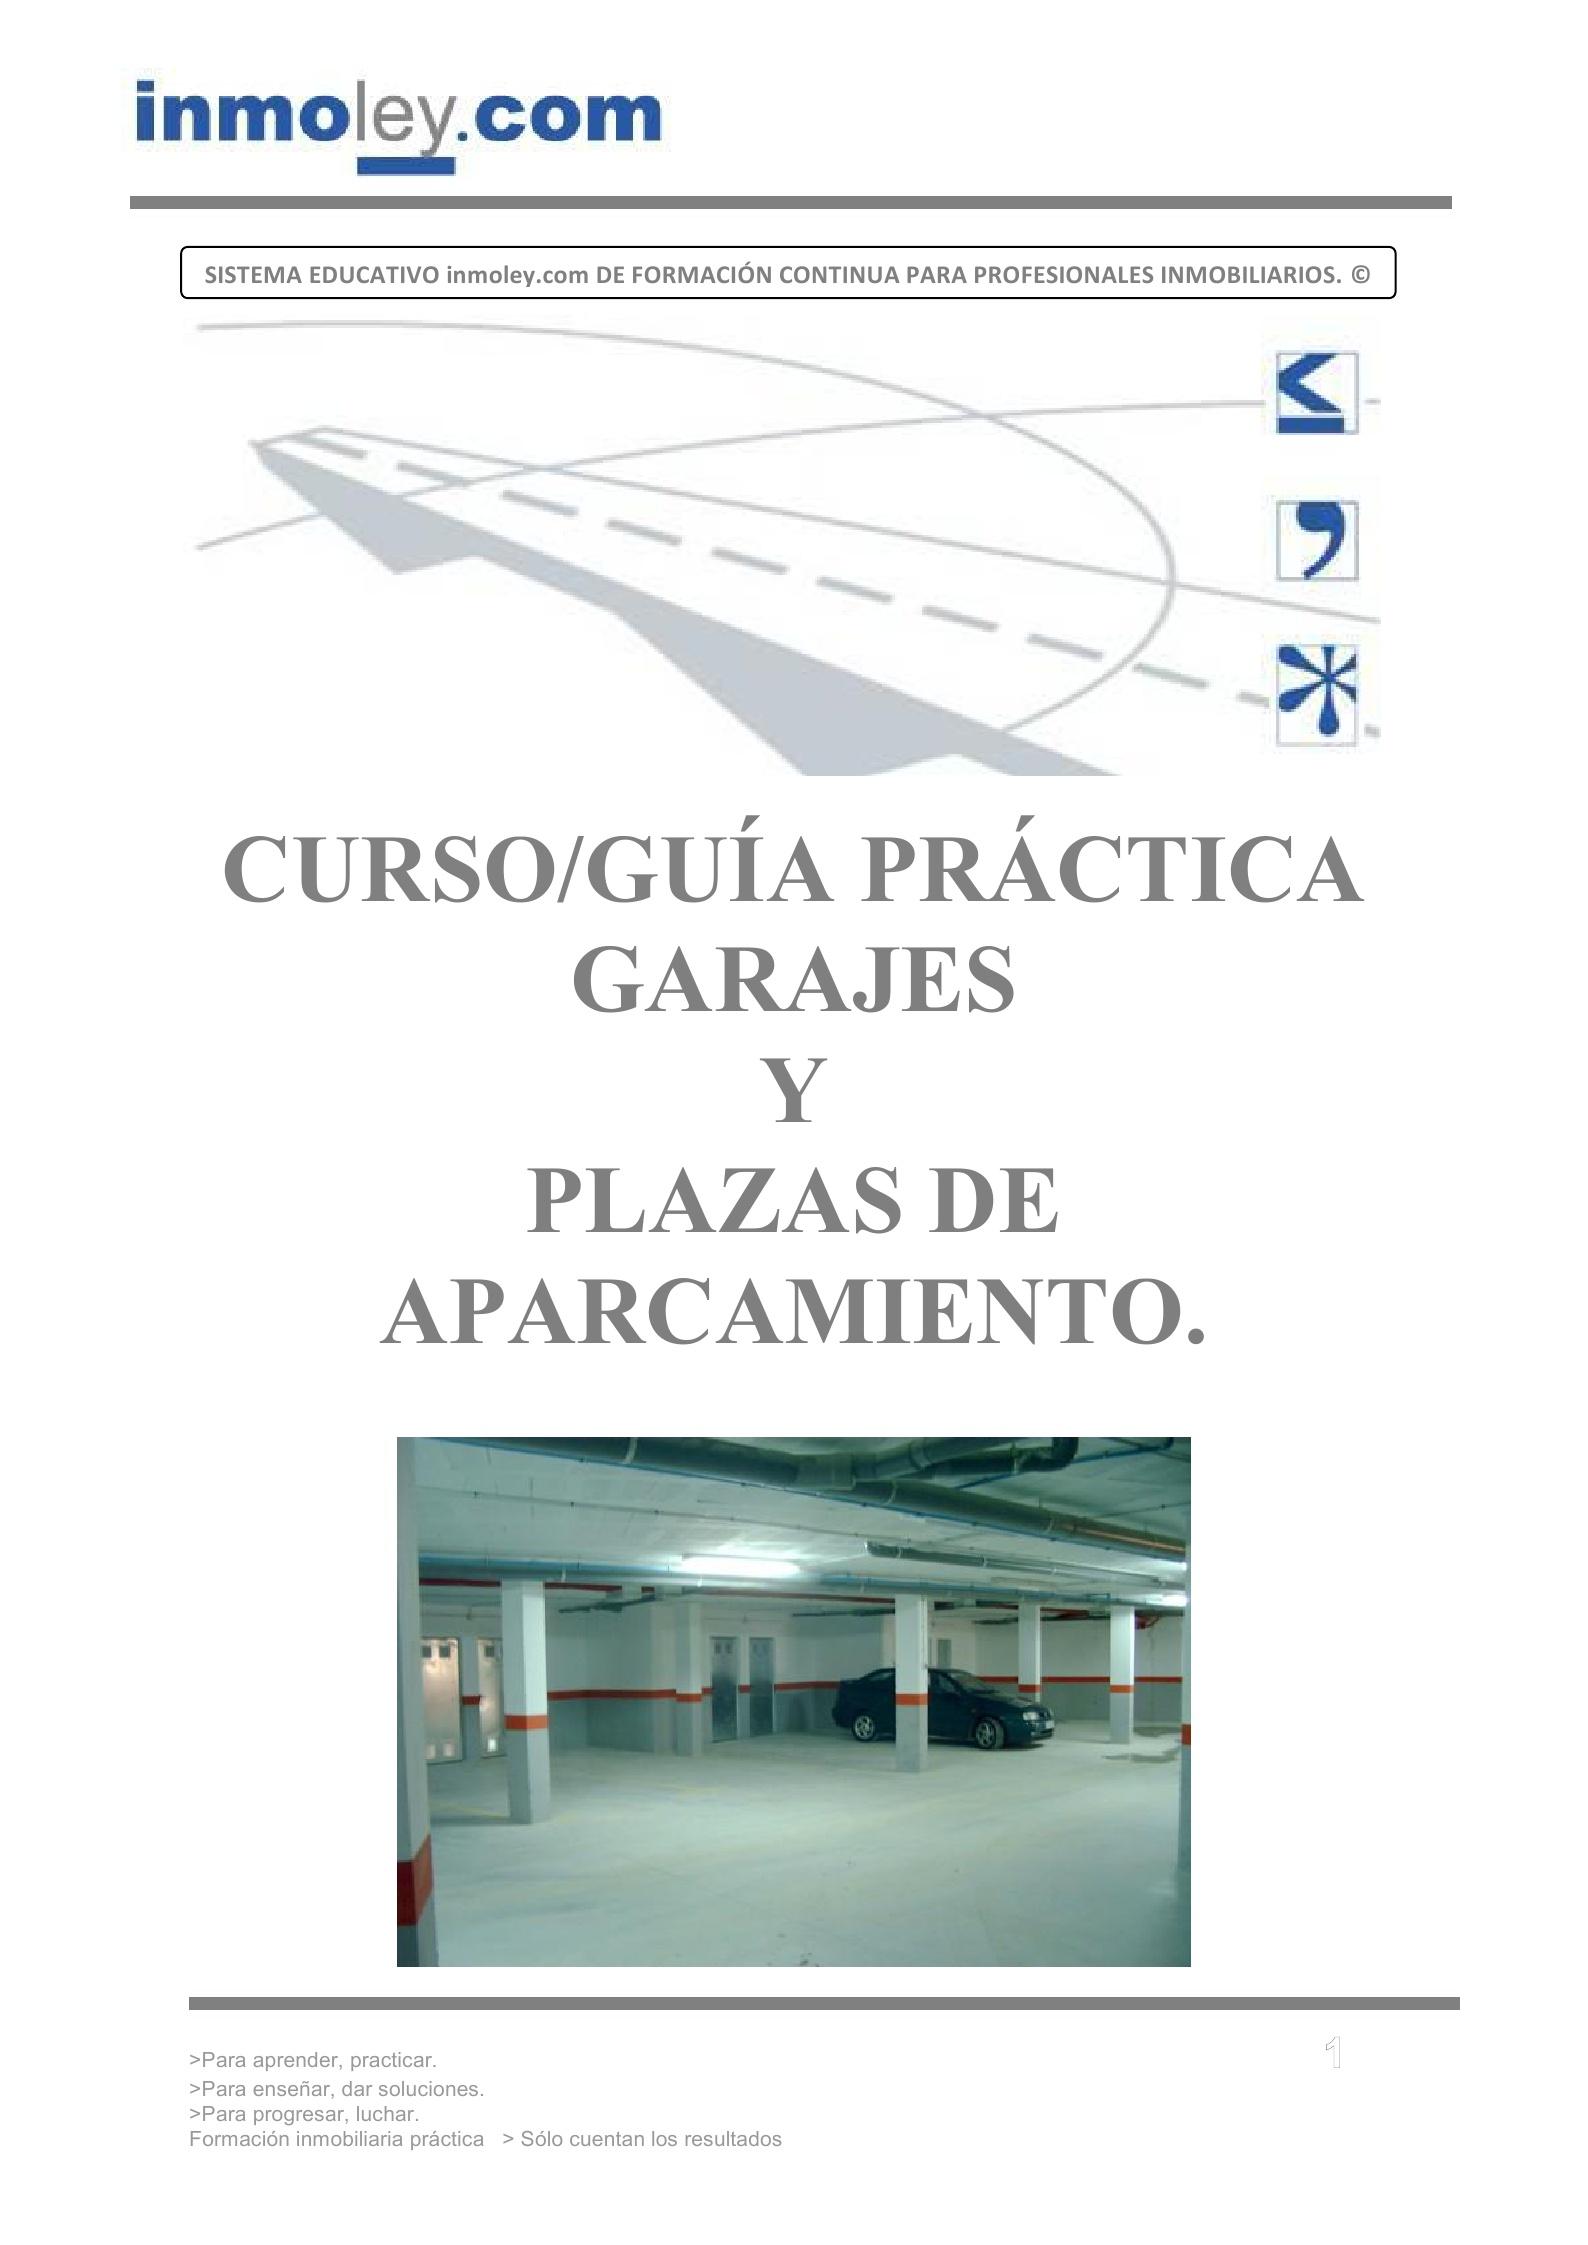 Garajes plazas de garaje contrato de garaje - Contrato de alquiler de garaje ...